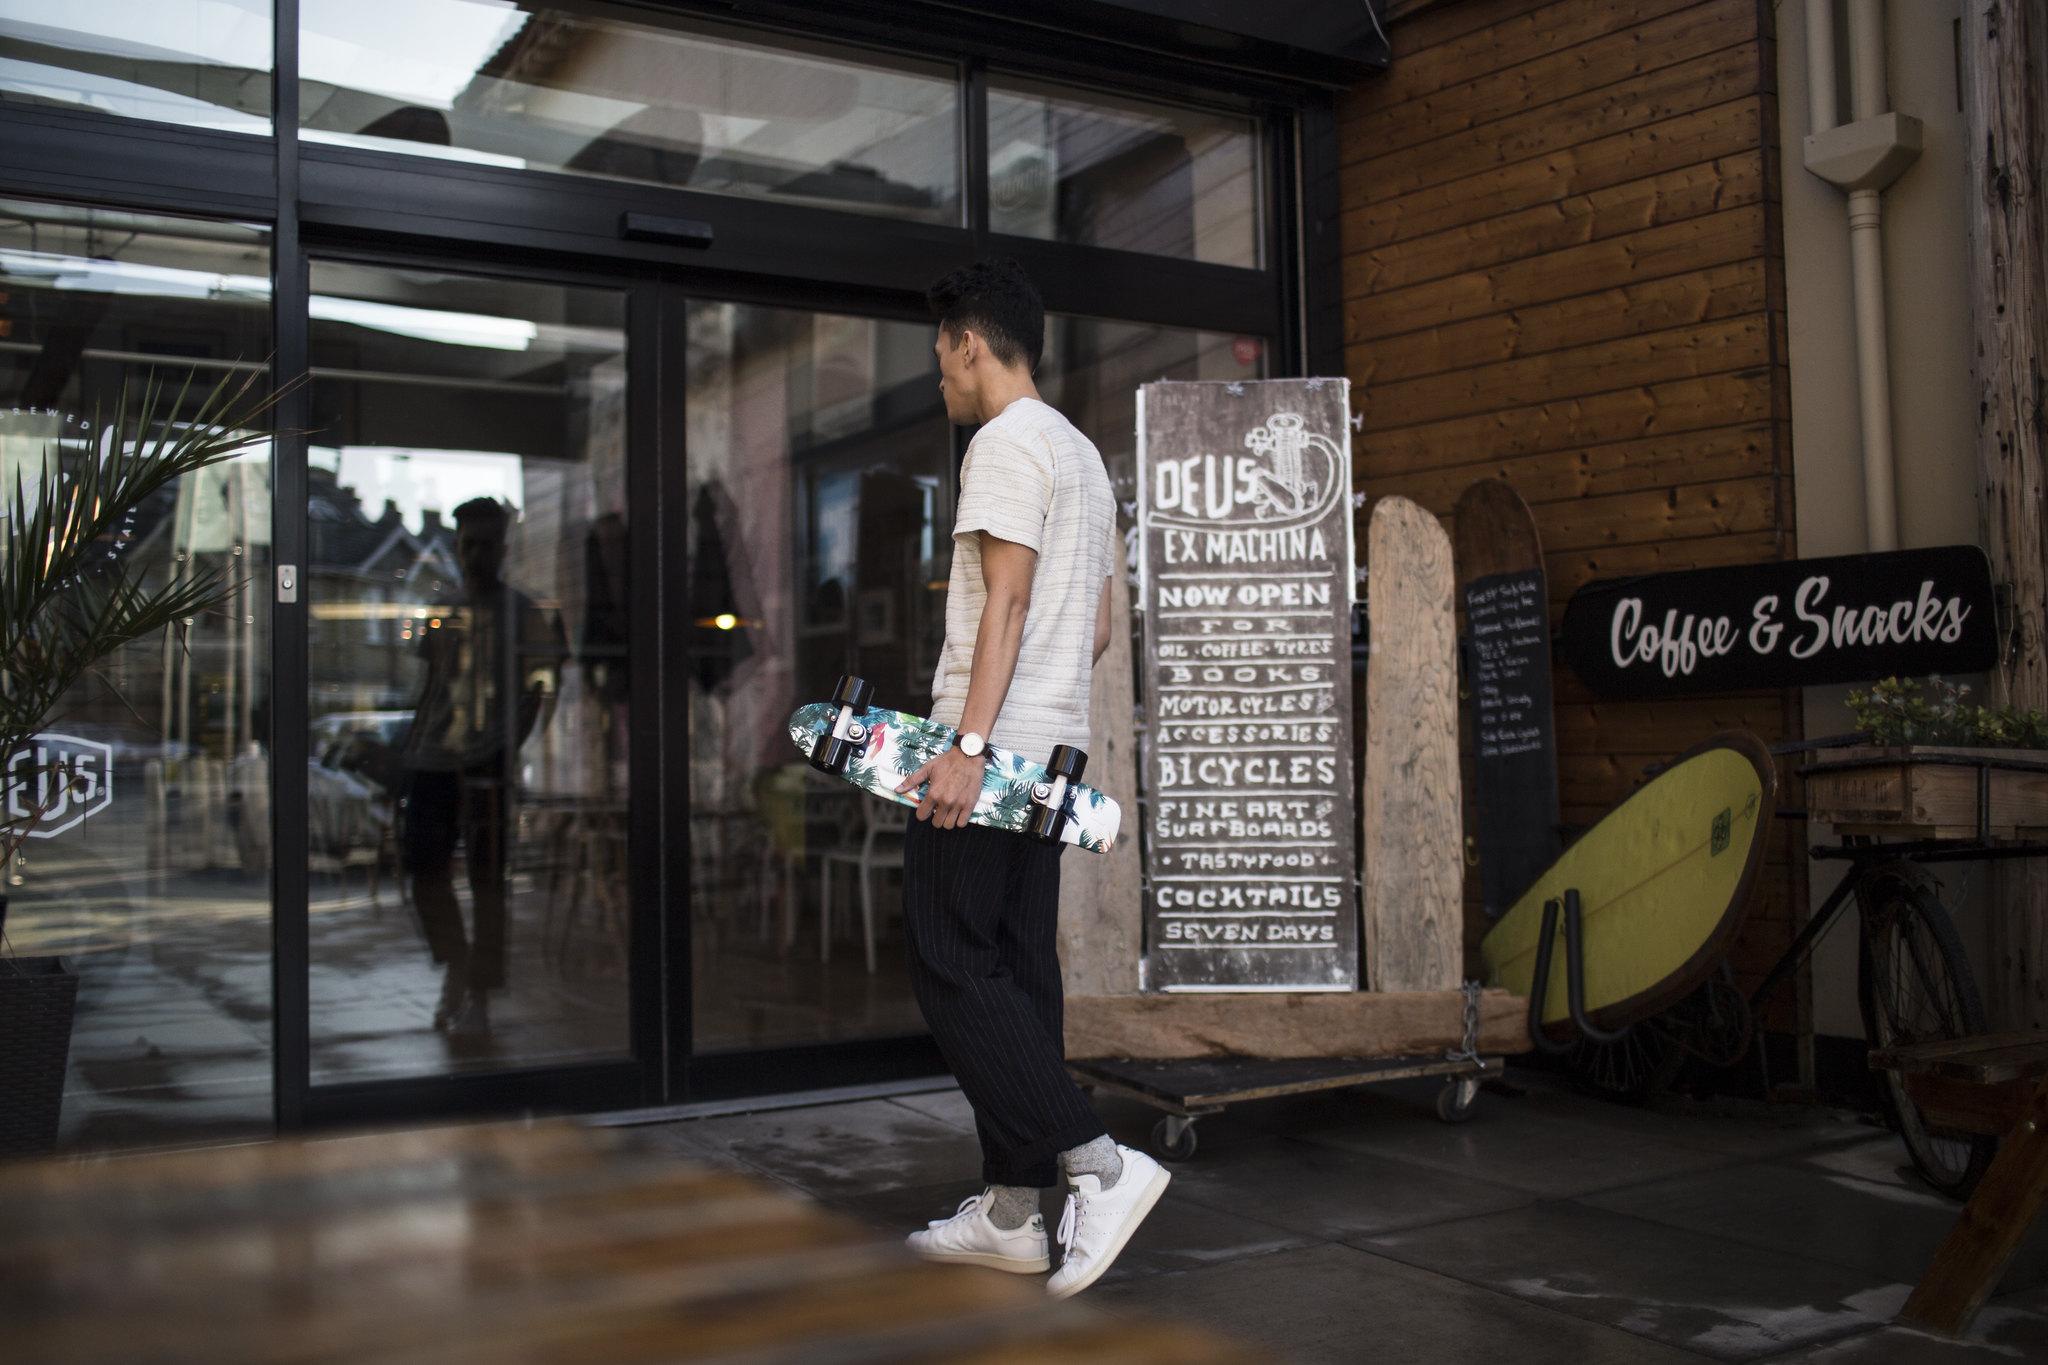 Jordan_Bunker_penny_skateboards_1